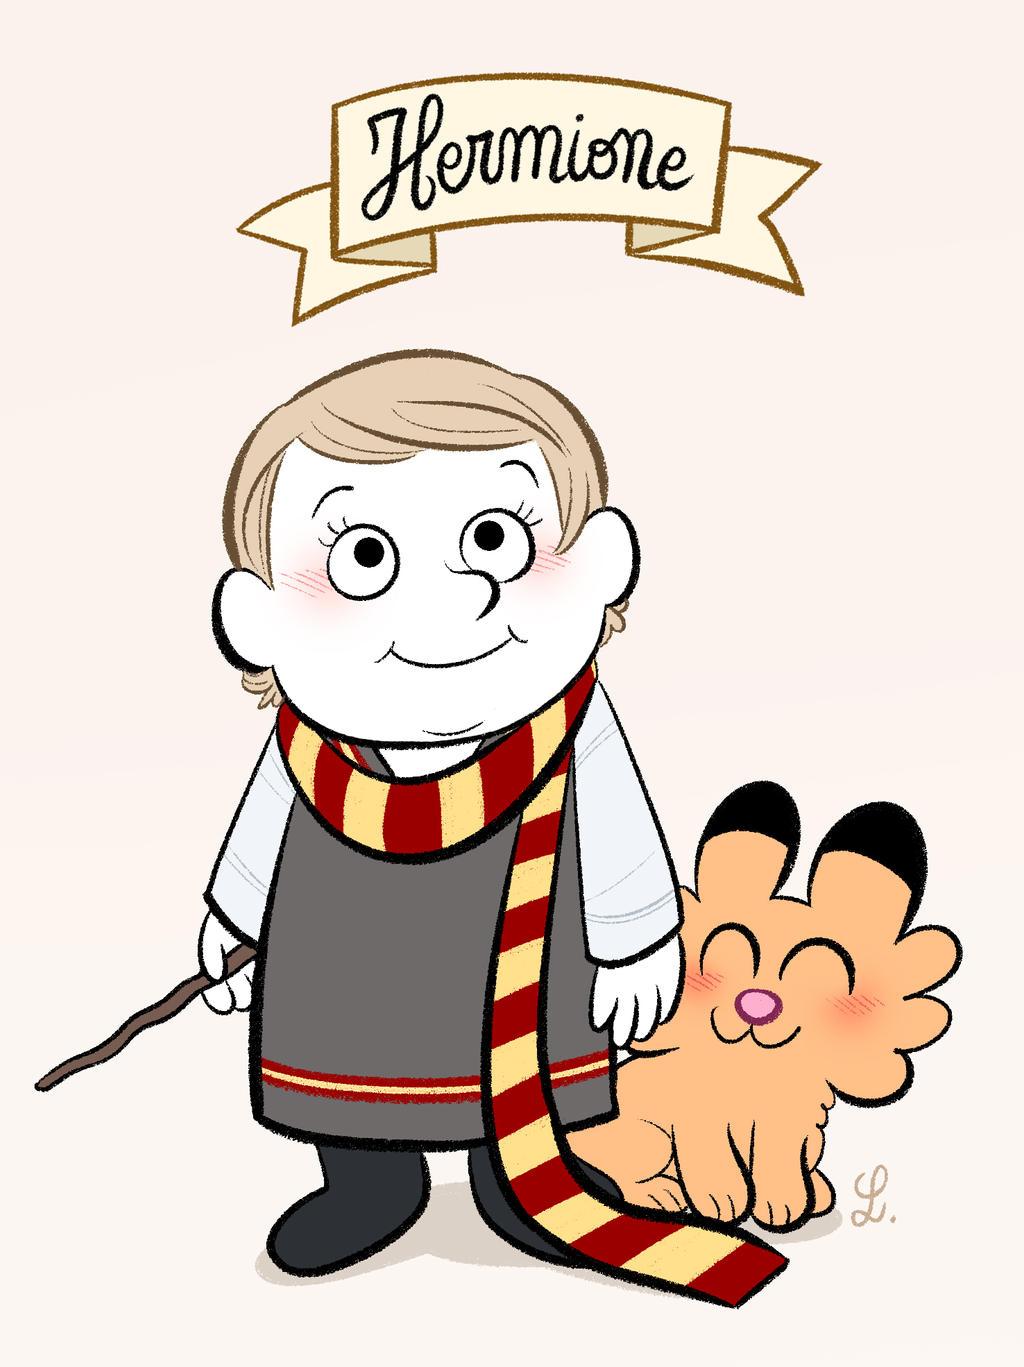 Hermione by bloglaurel